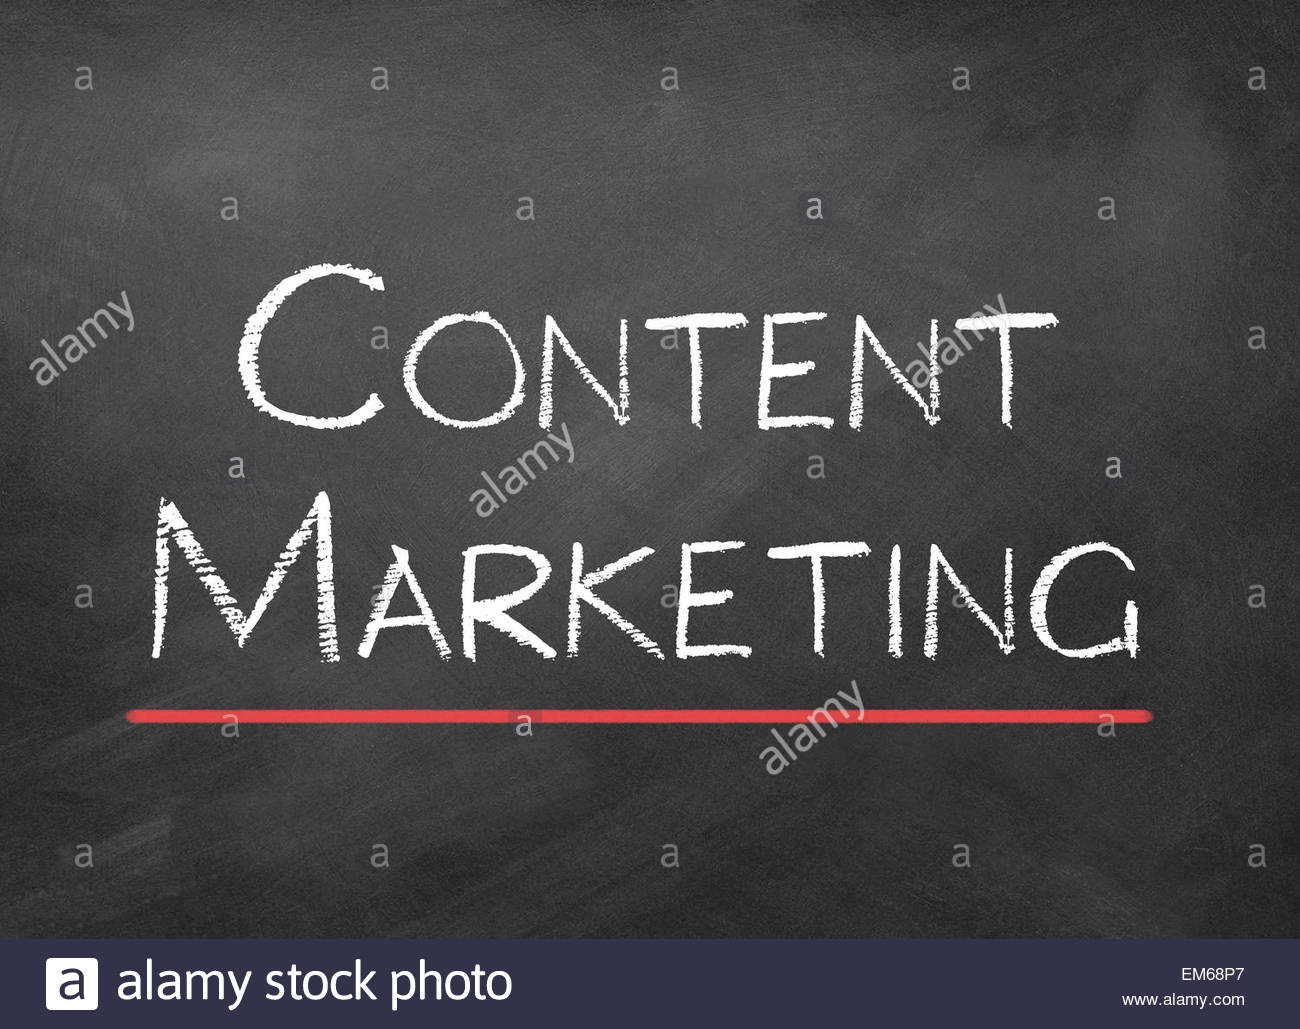 content marketing - Stock Image